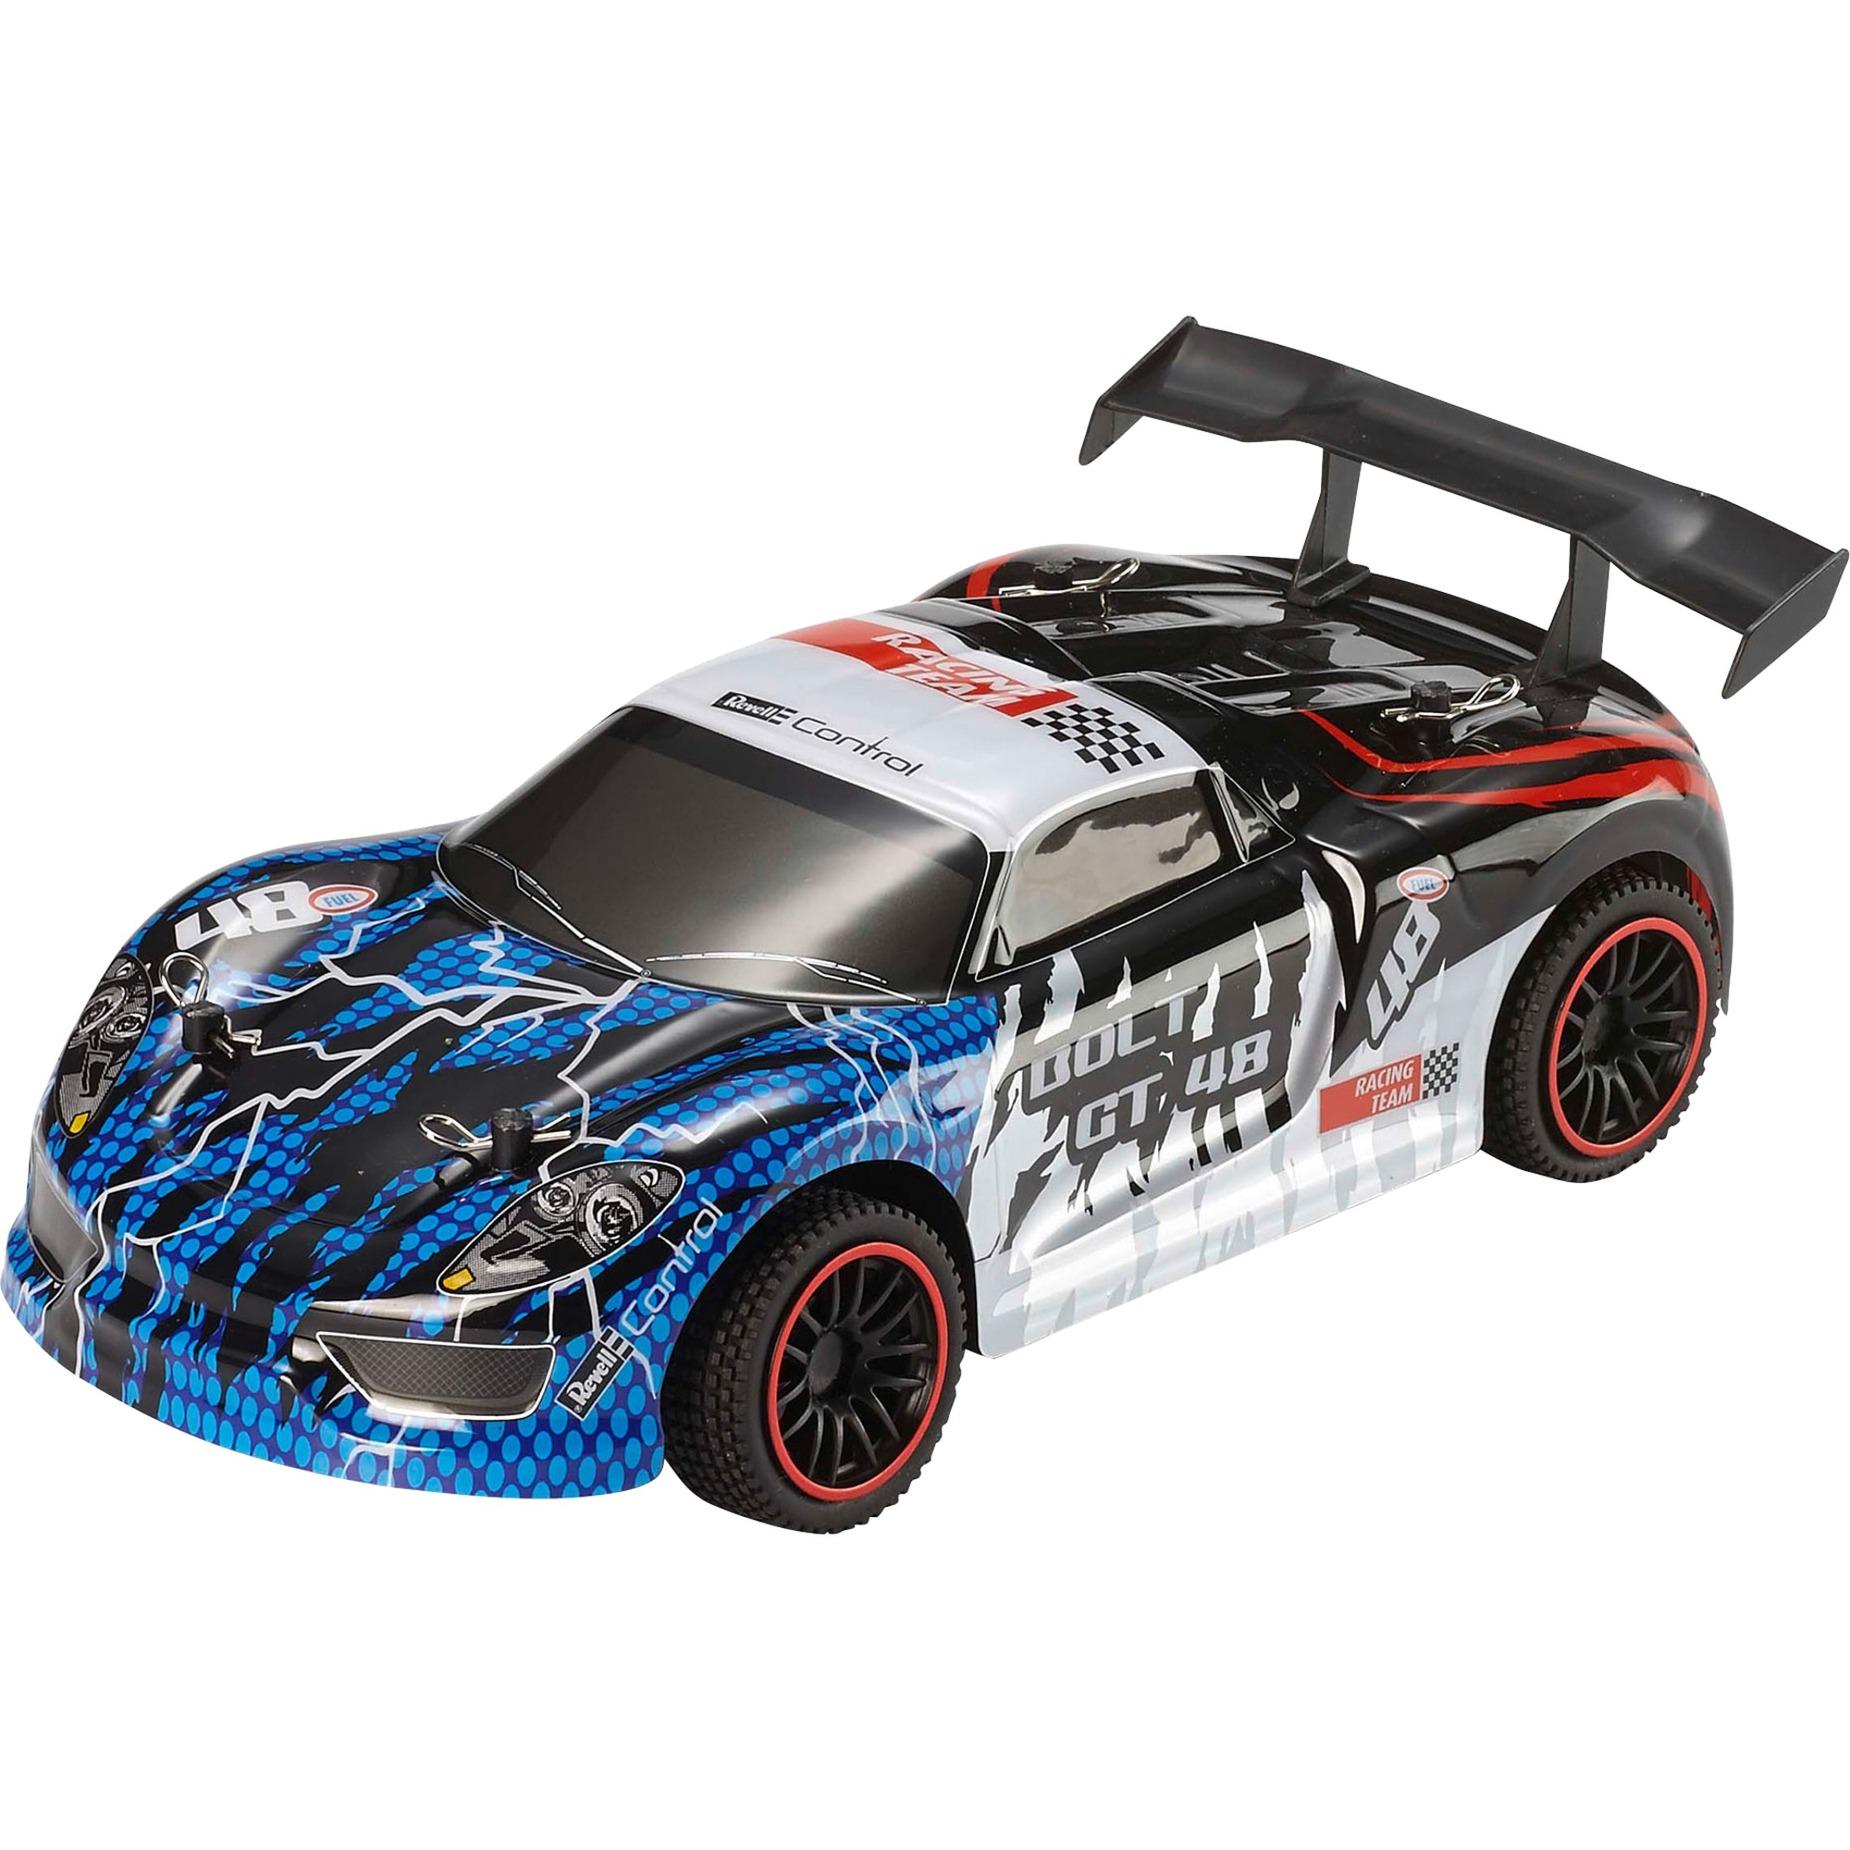 Control - Voiture de Course Radiocommandée - Car Bolt GT 48, RC